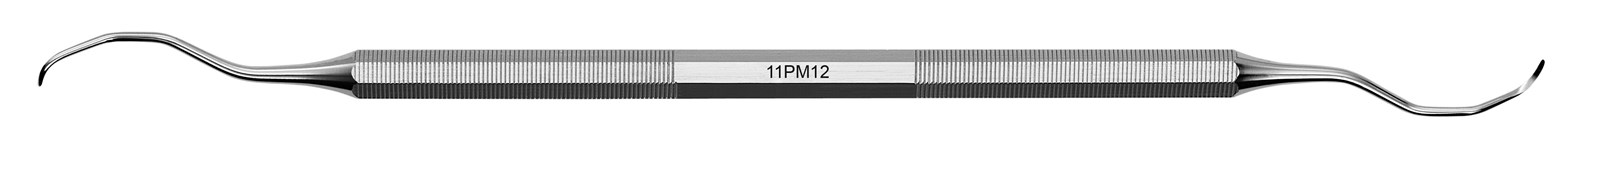 Kyreta Gracey Mini - 11PM12, ADEP červený